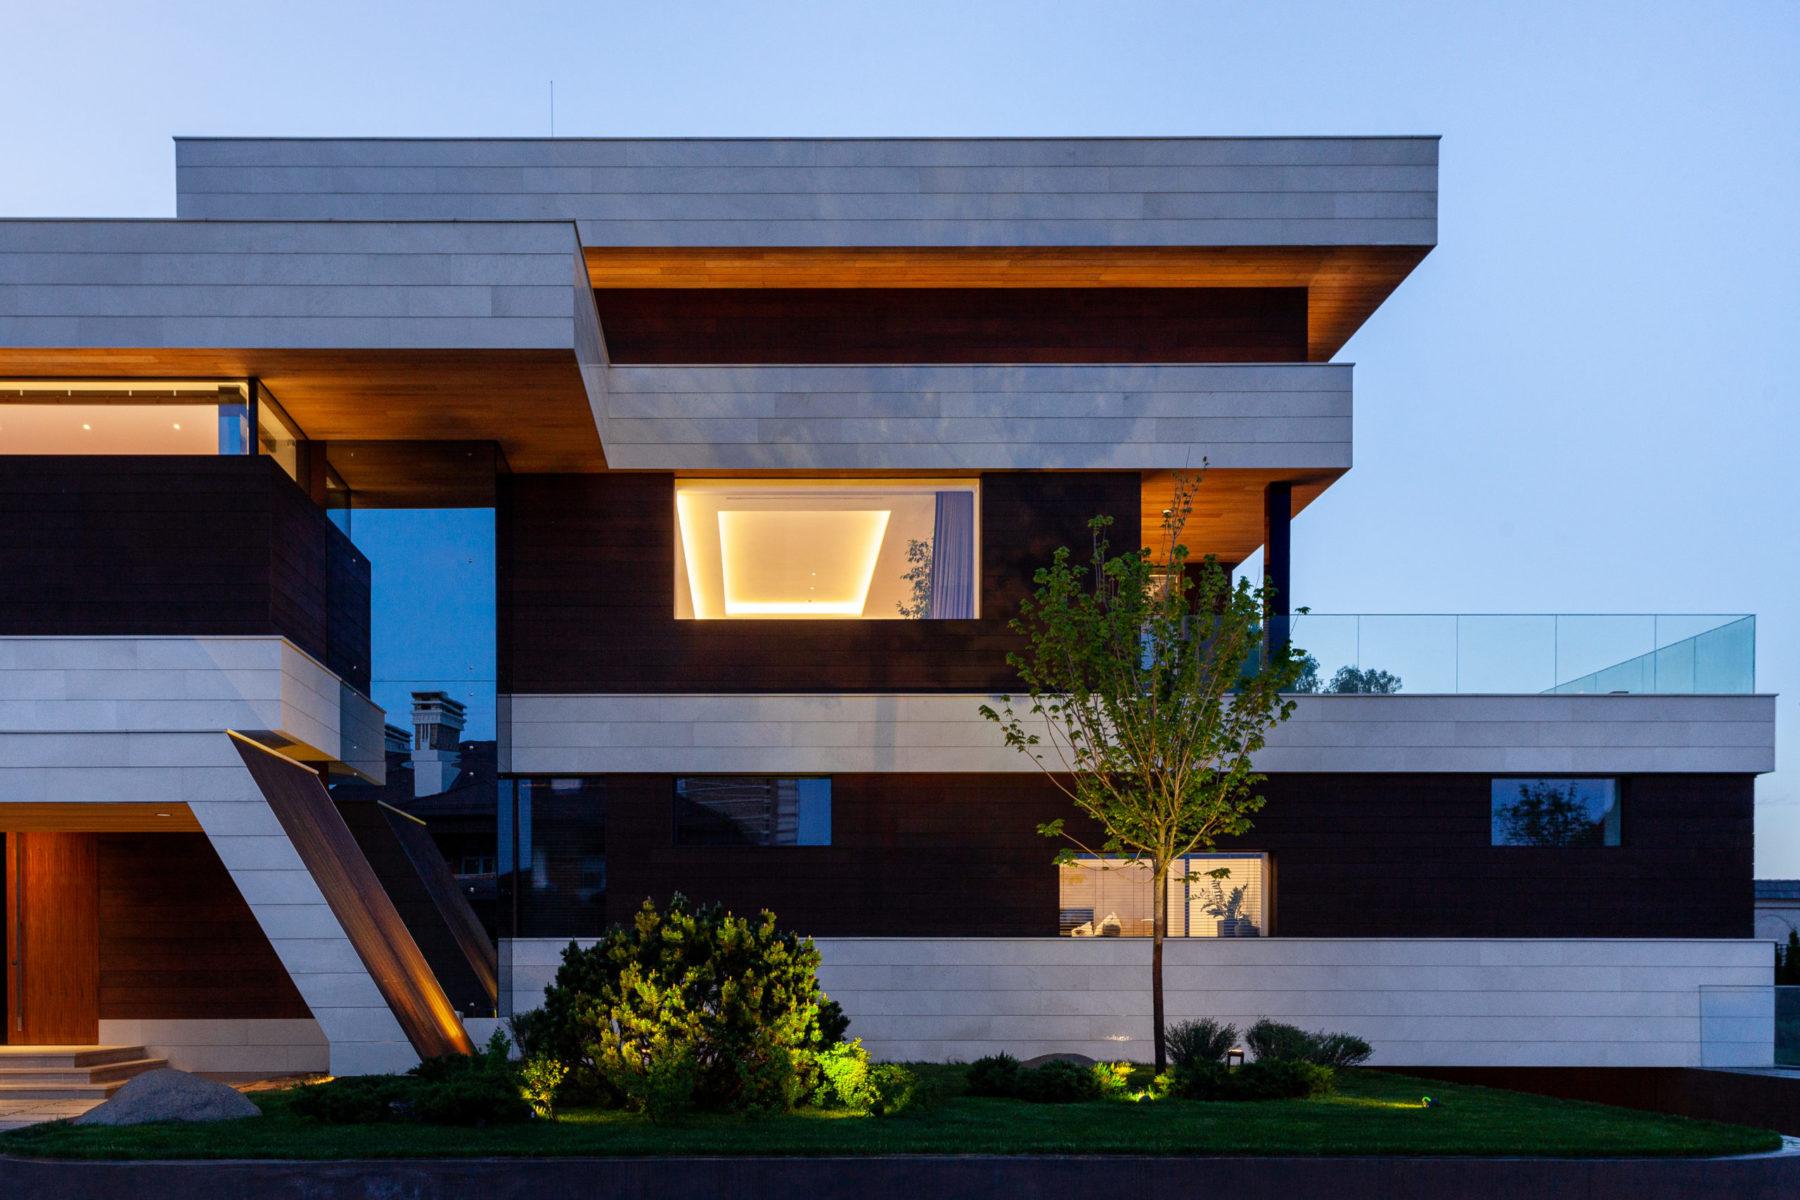 Минимализм в архитектуре загородного дома